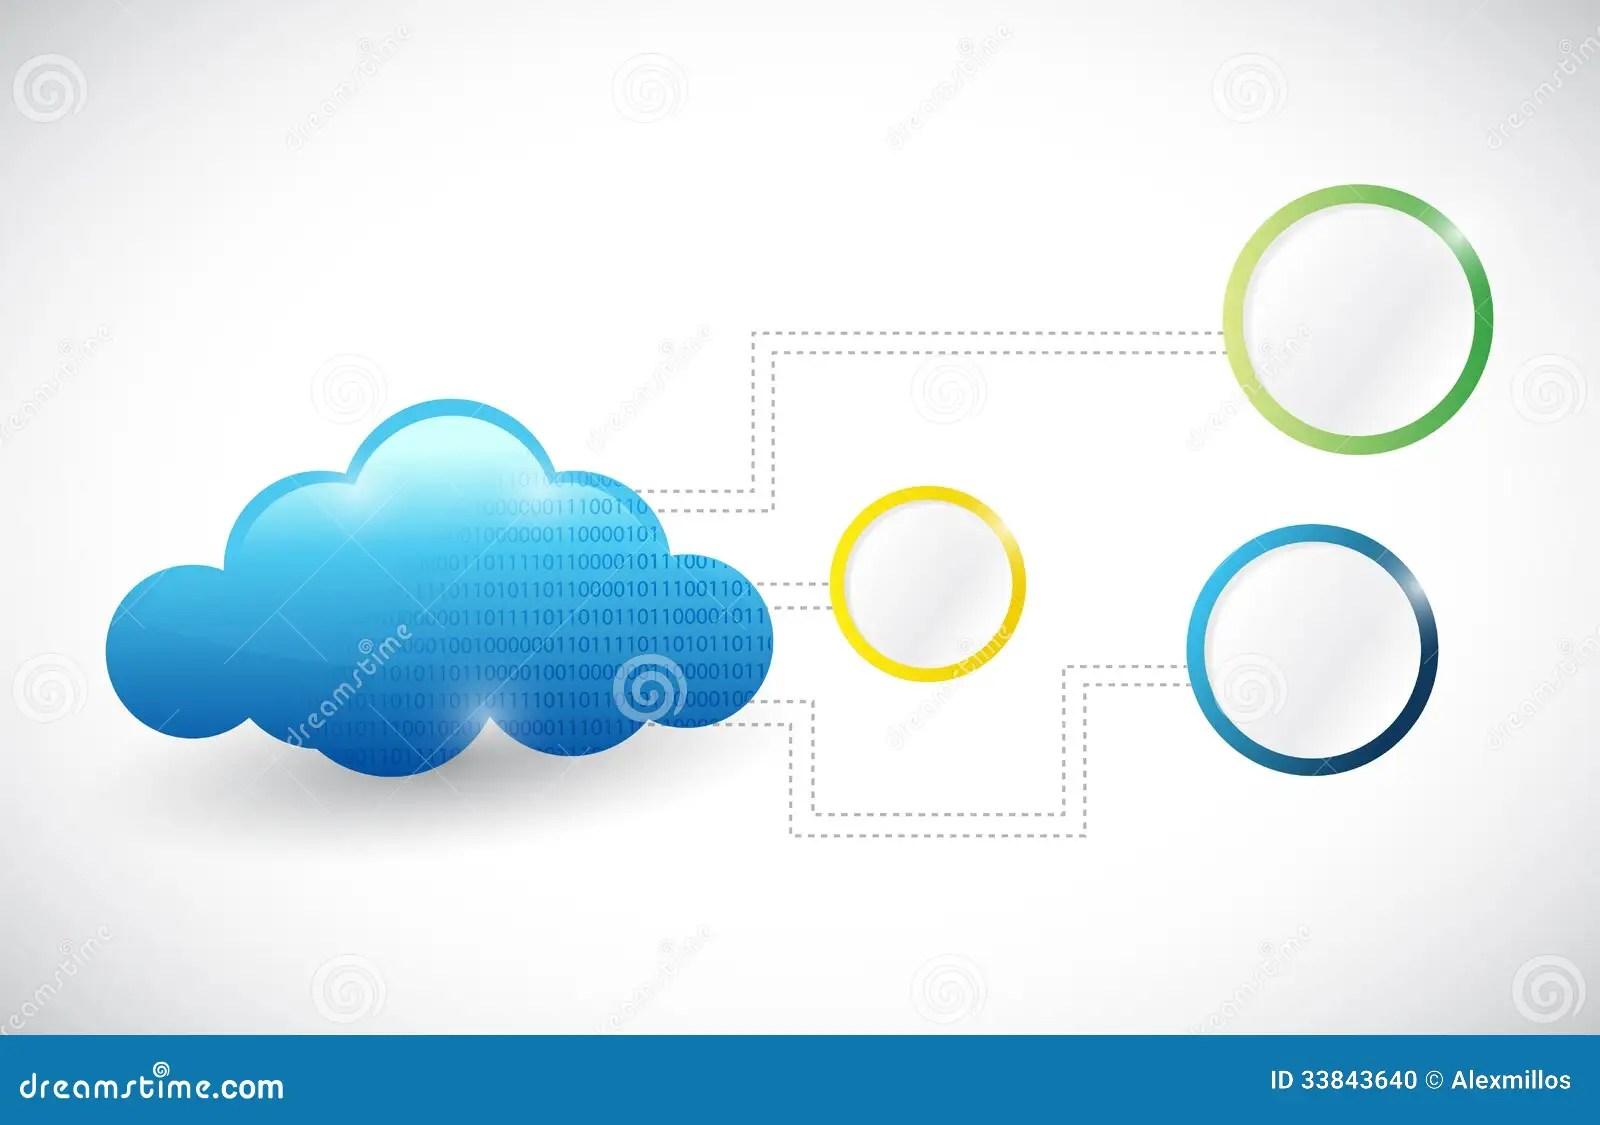 Cloud Network Diagram Stock Photos Image 20934463